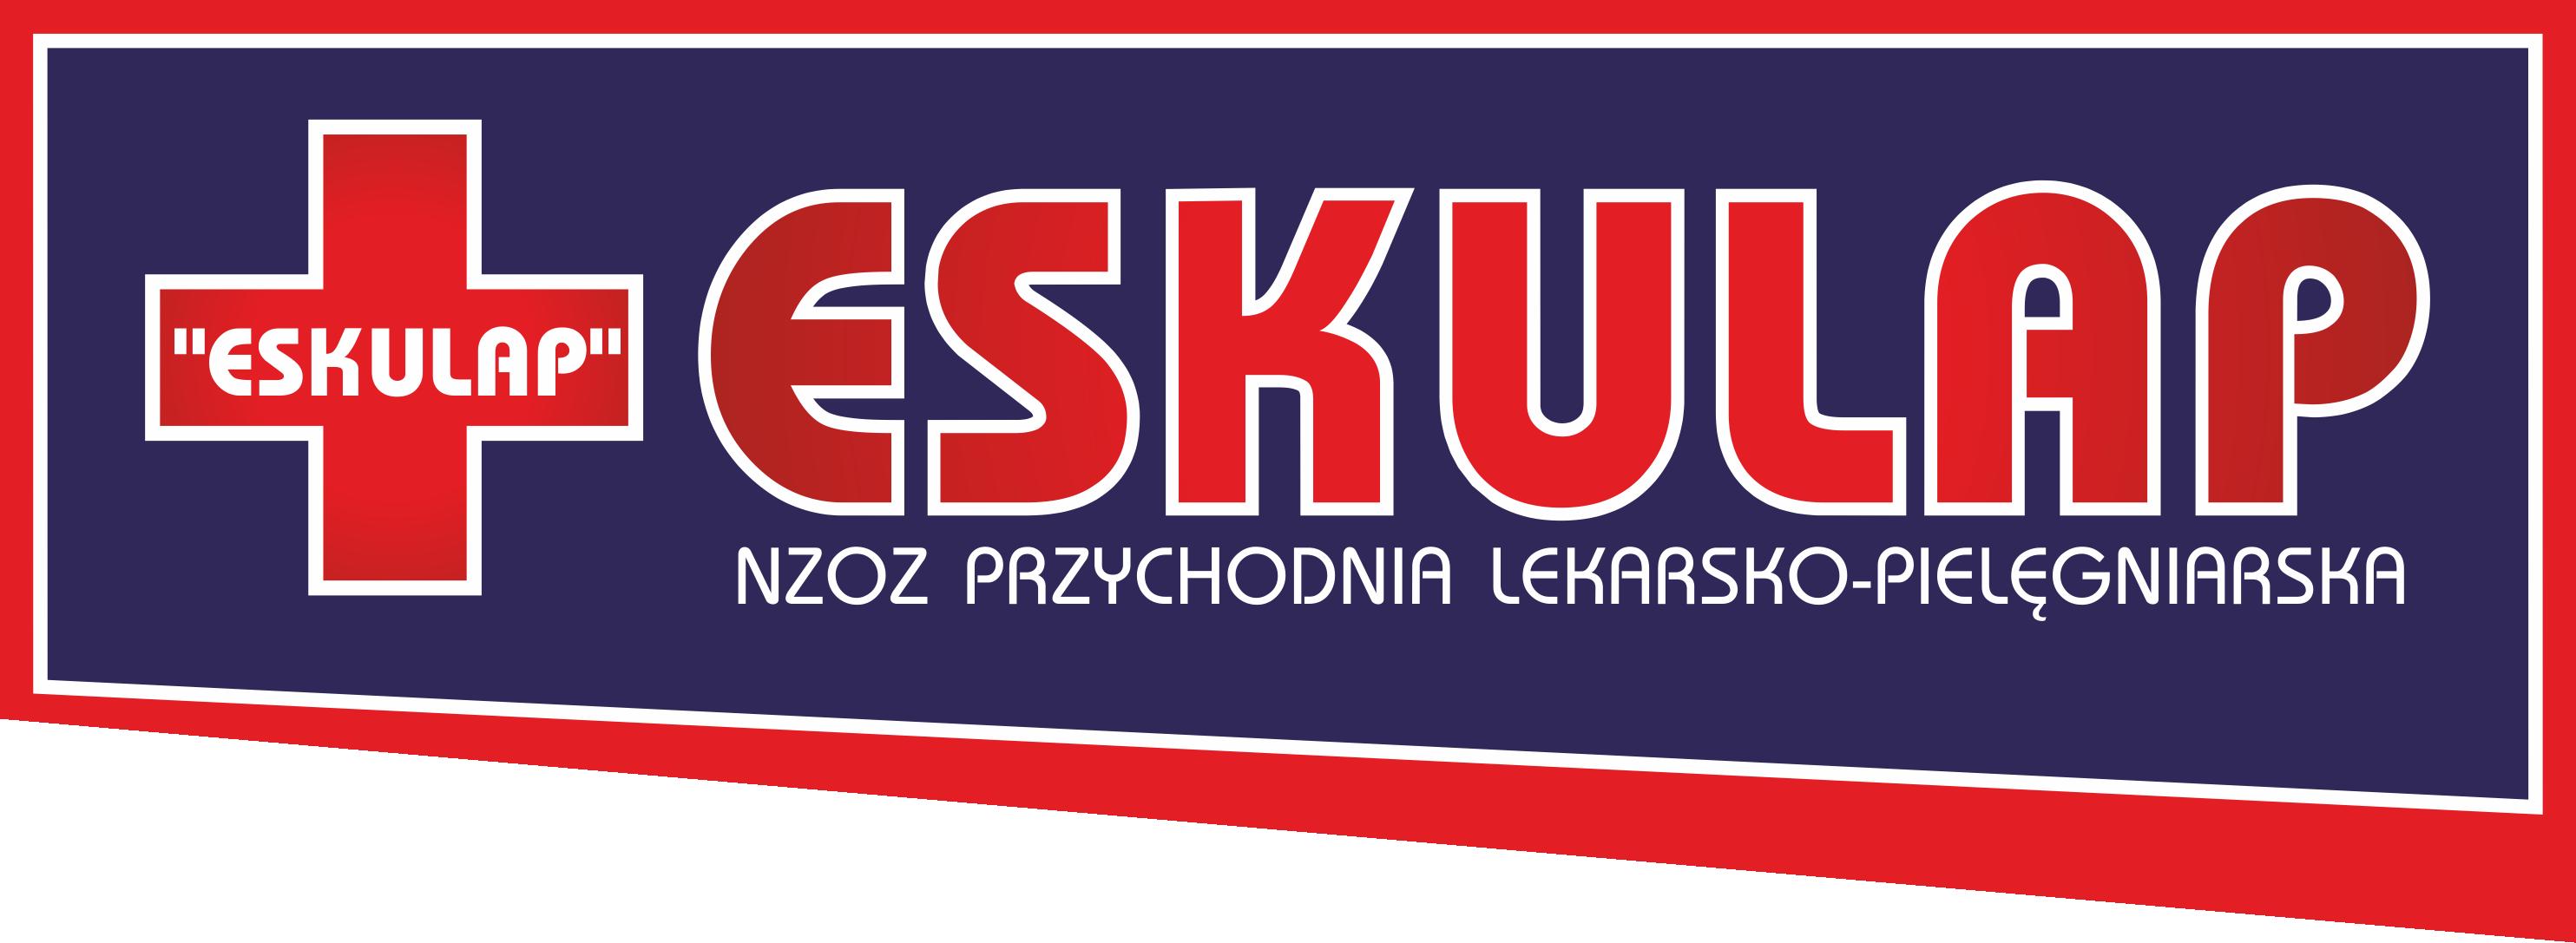 ESKULAP-logo